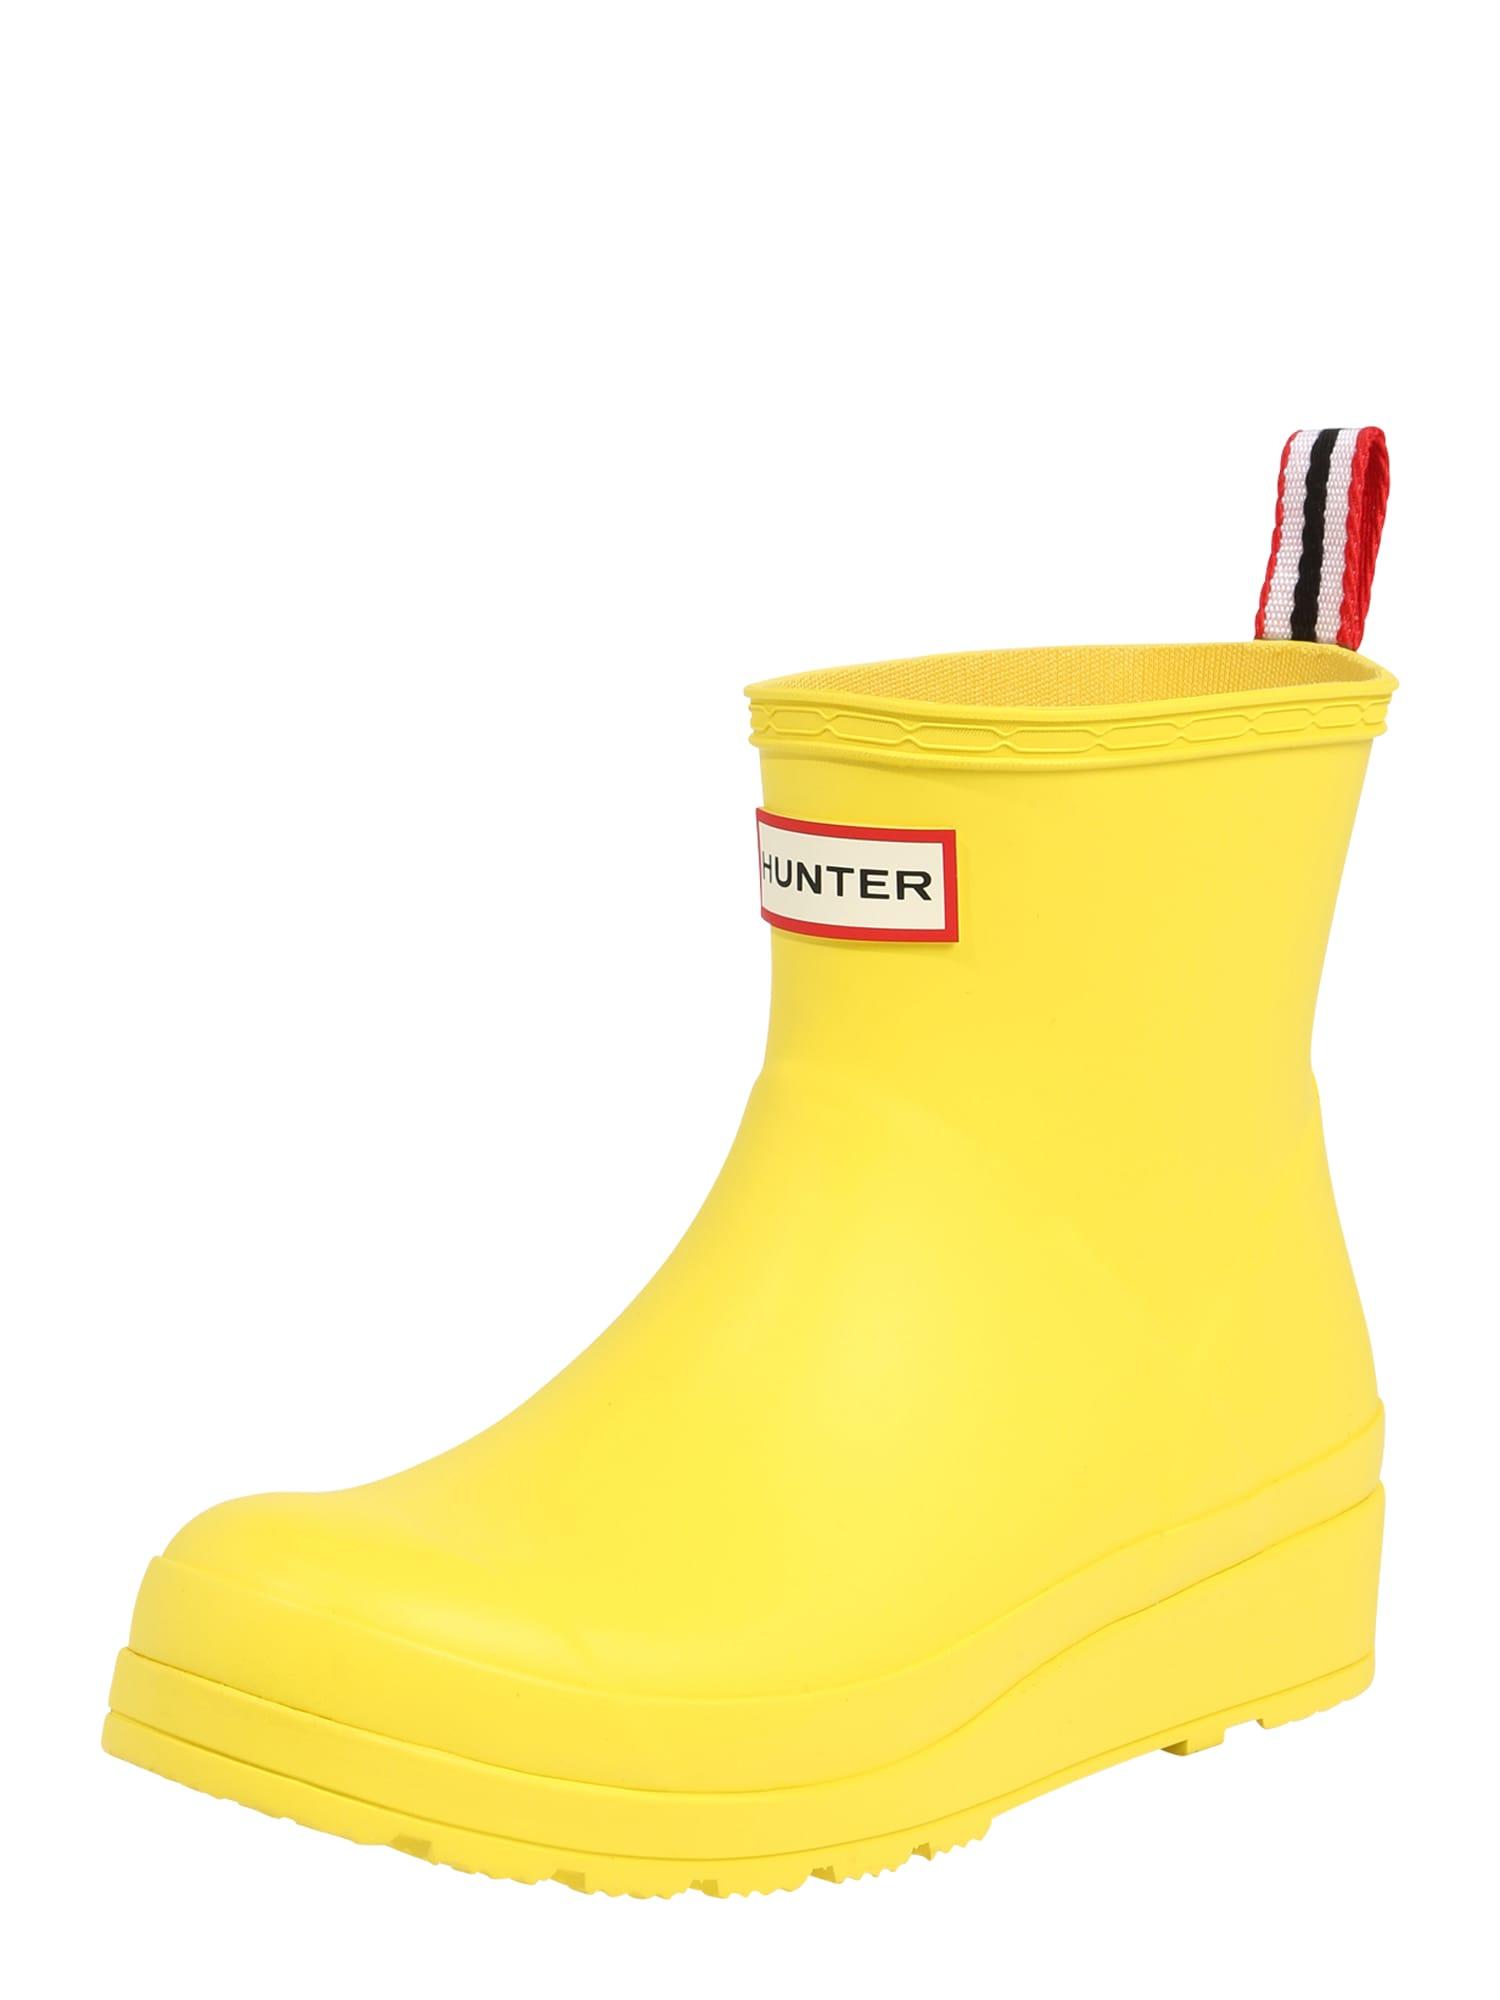 HUNTER Guminiai batai 'Play' geltona